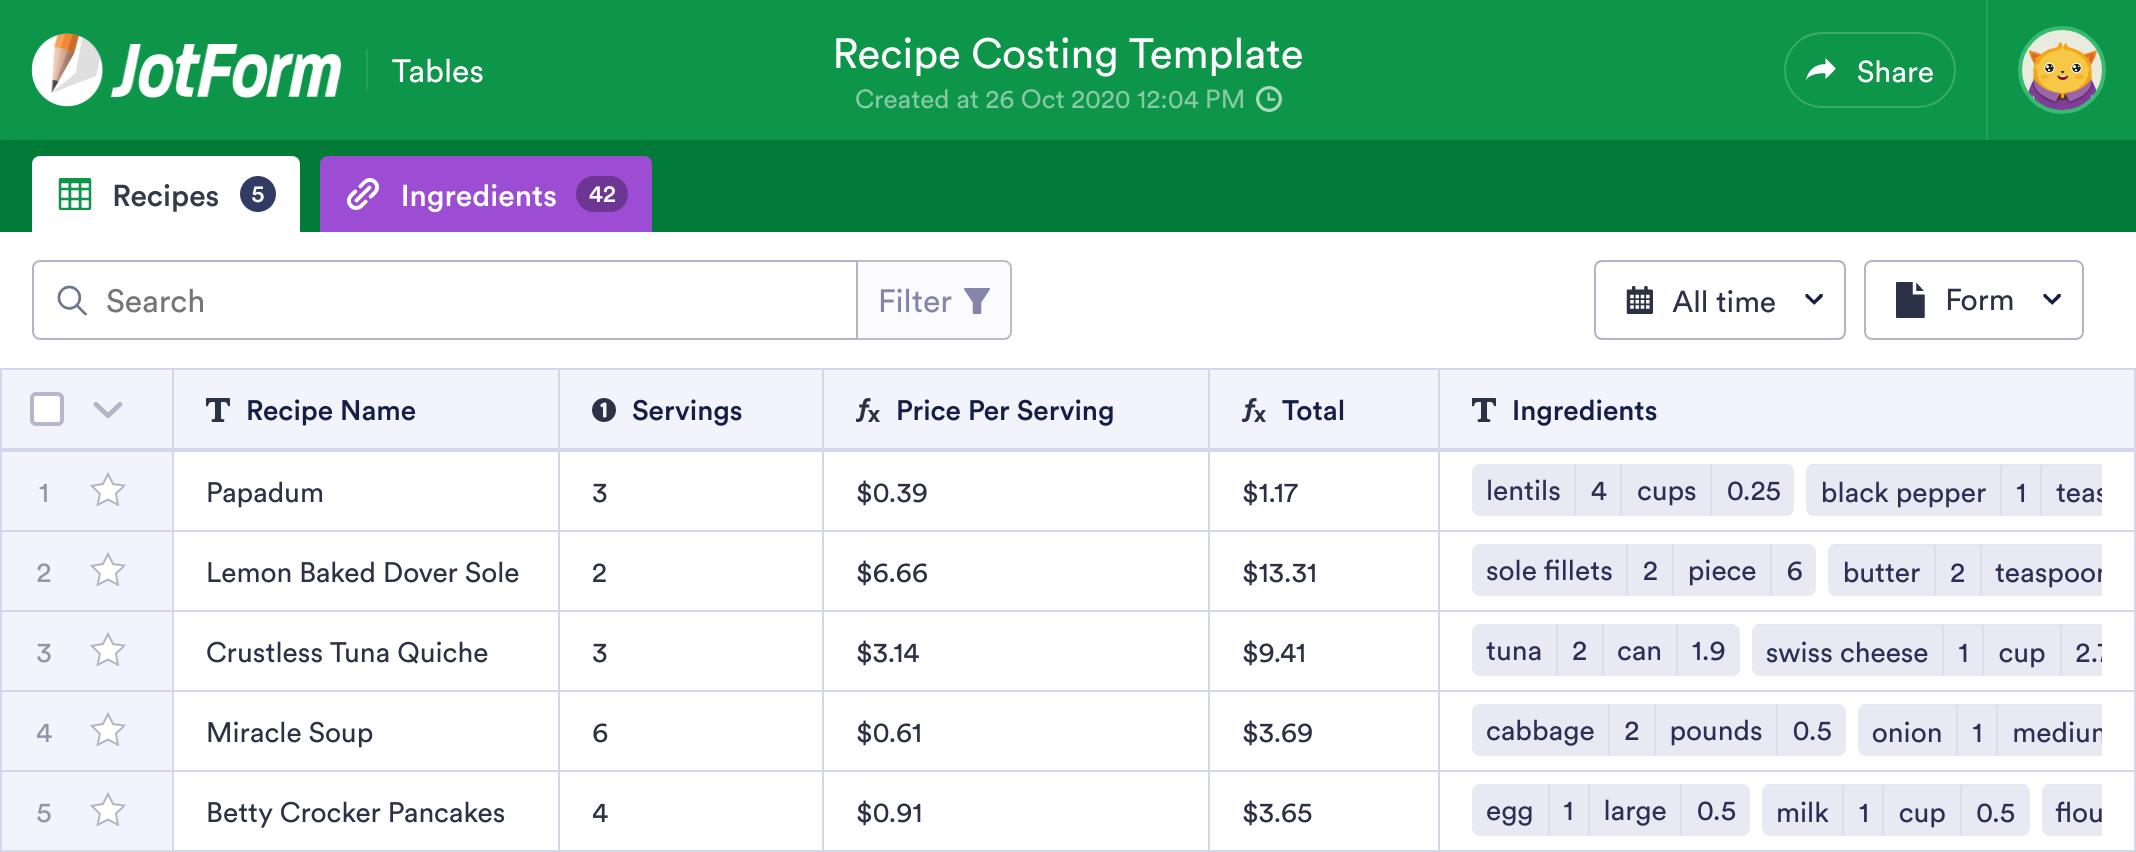 Recipe Costing Template Jotform Tables